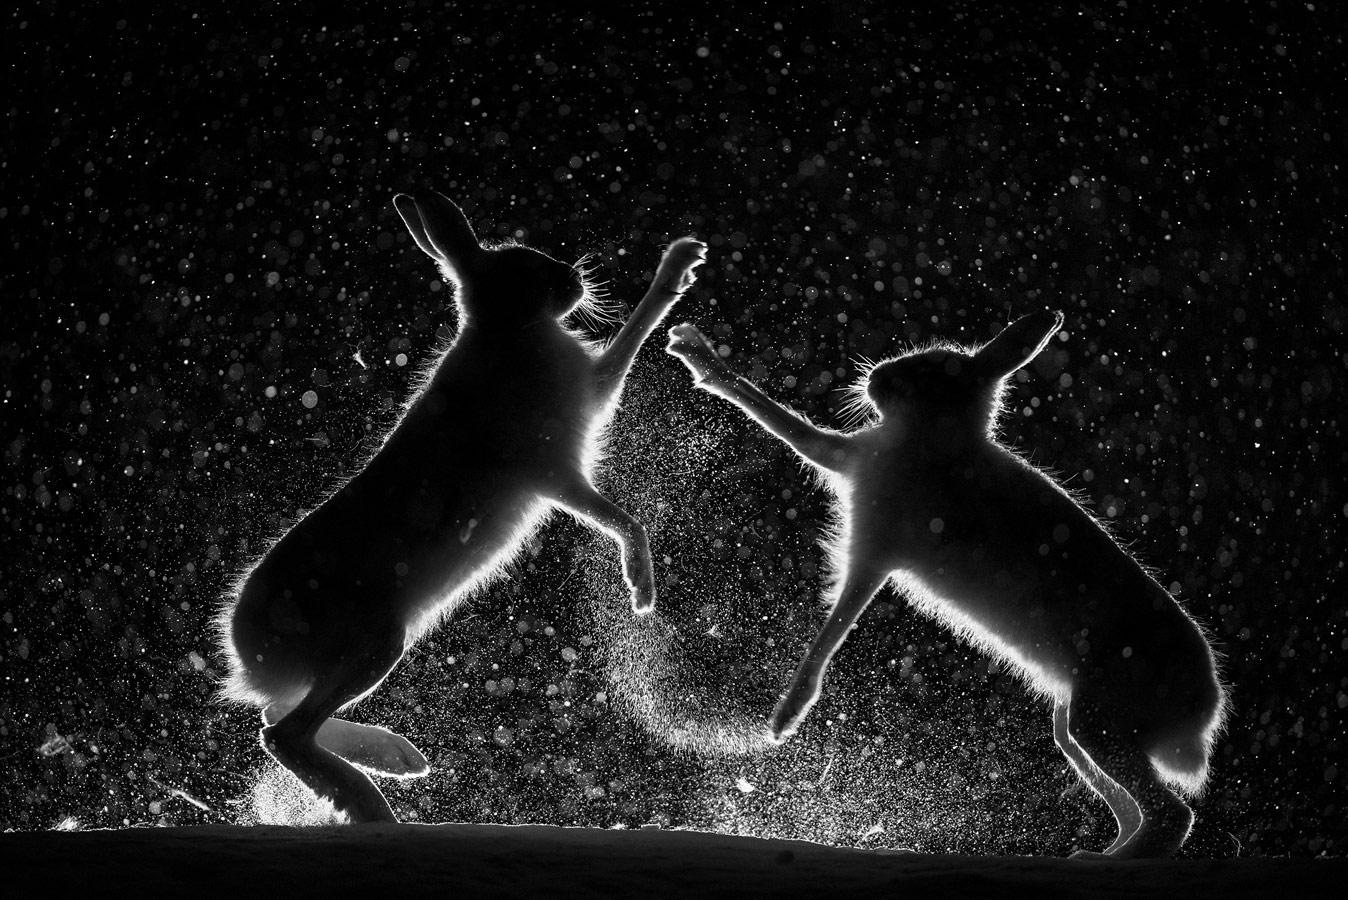 The Snow Scaffle, © Erlend Haarberg, Winner, Golden Turtle Photo Contest